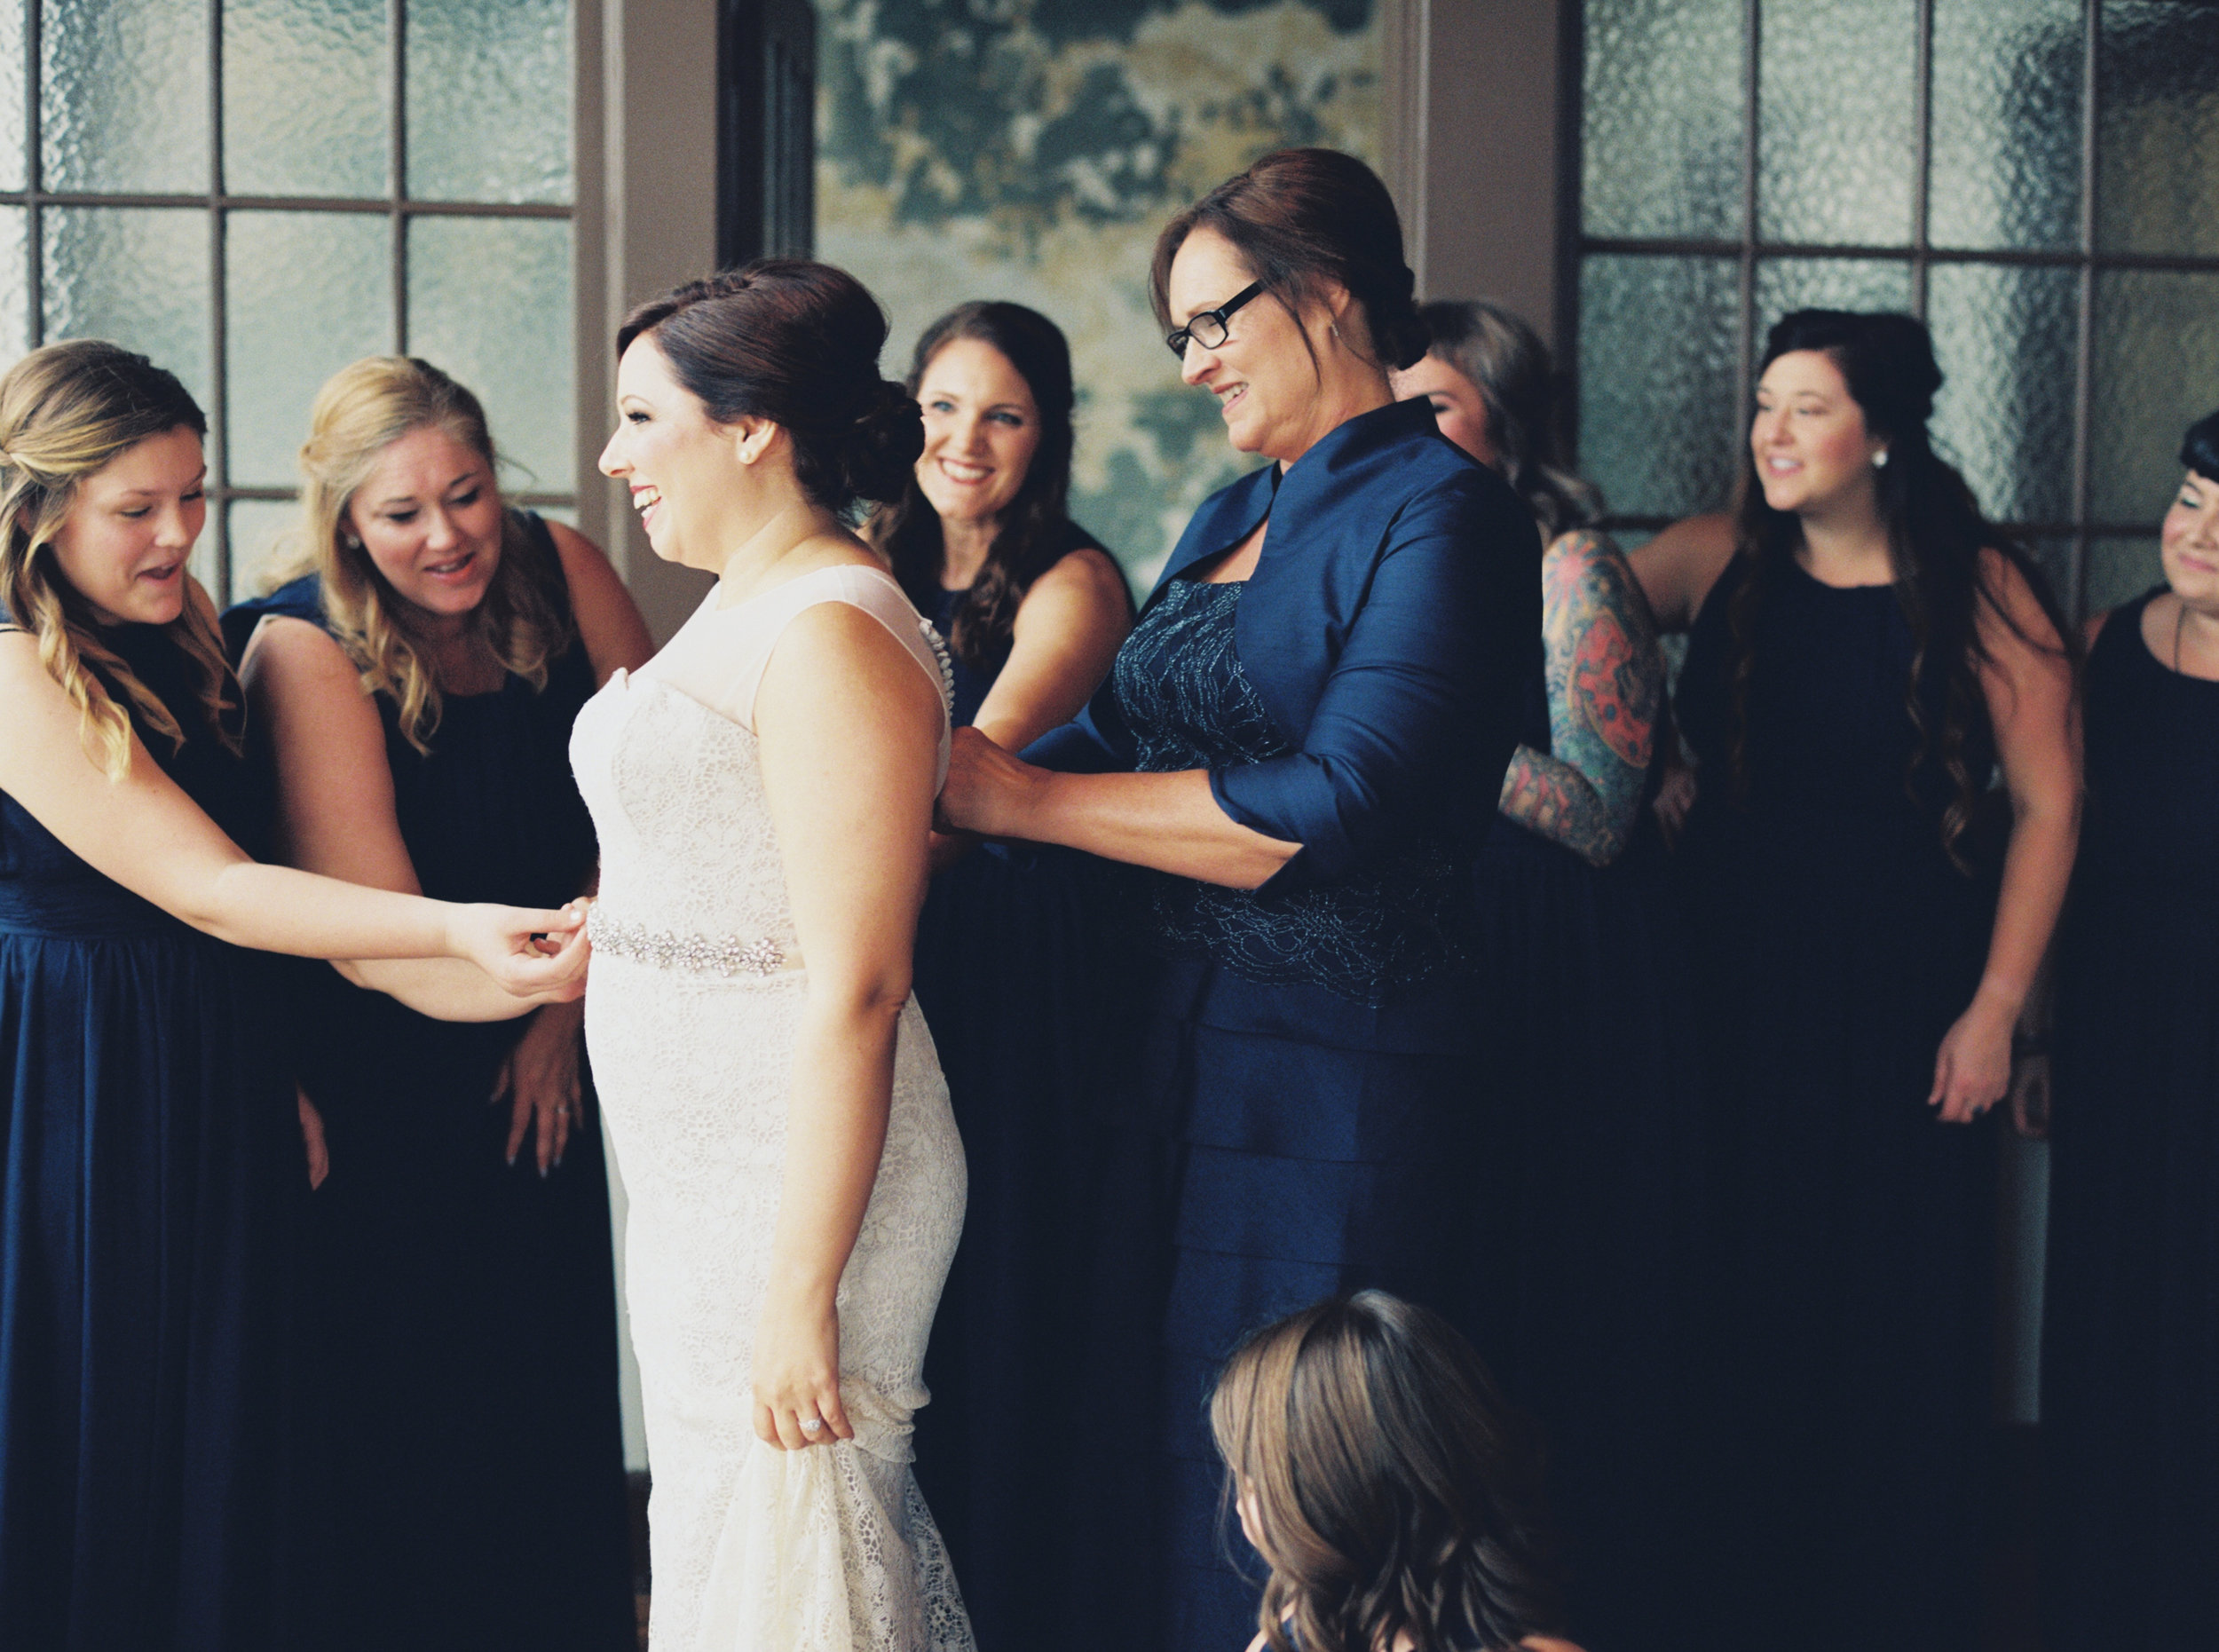 Jessica_Bryan_Wedding_Standard_Knoxville_Abigail_Malone_Photography-109.jpg